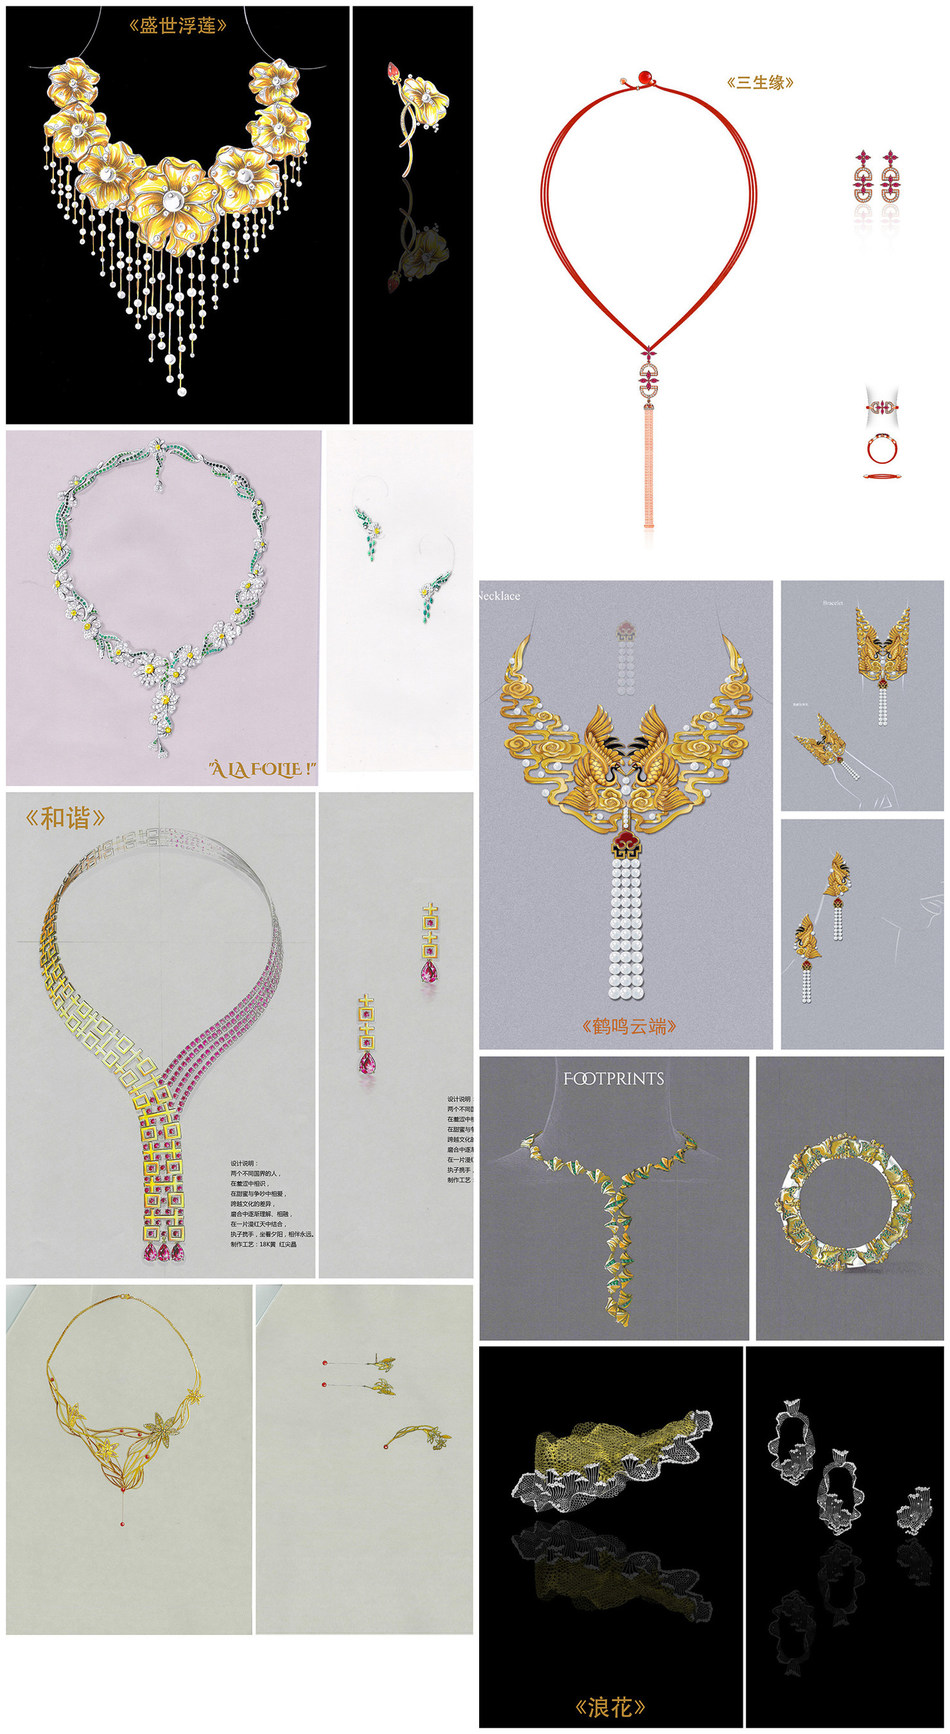 Finalists of Gem-Set Gold Jewellery Category